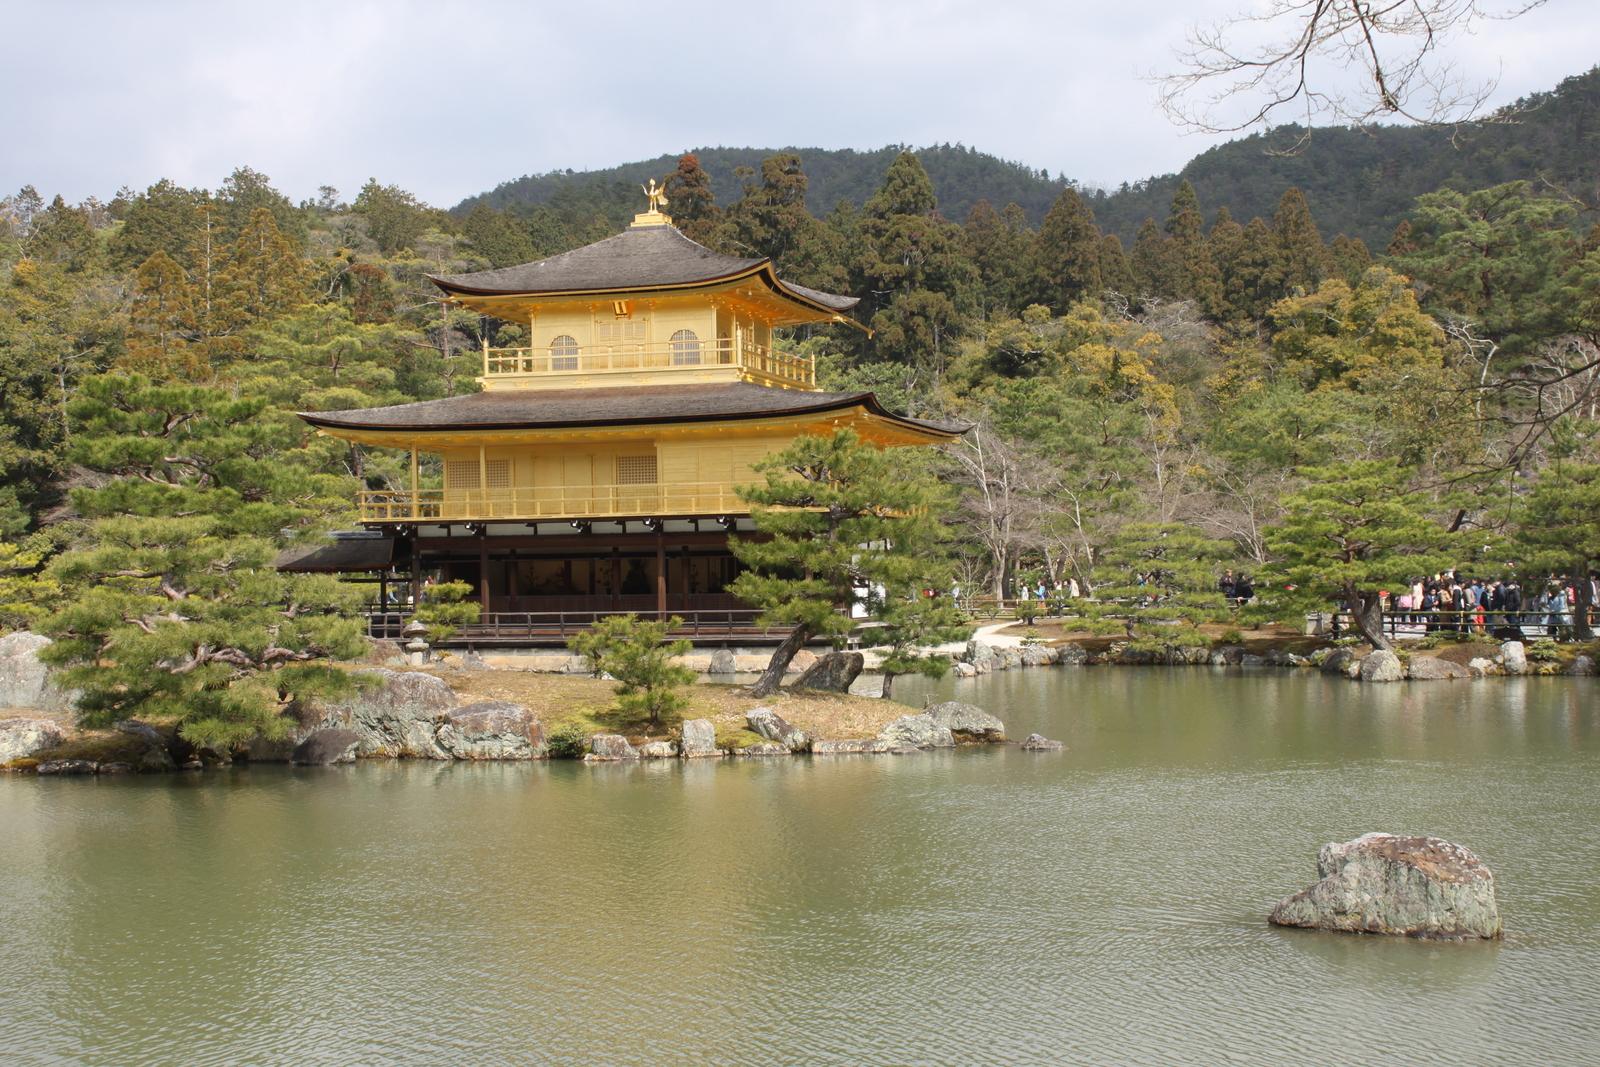 Silberne Pagode Kyoto